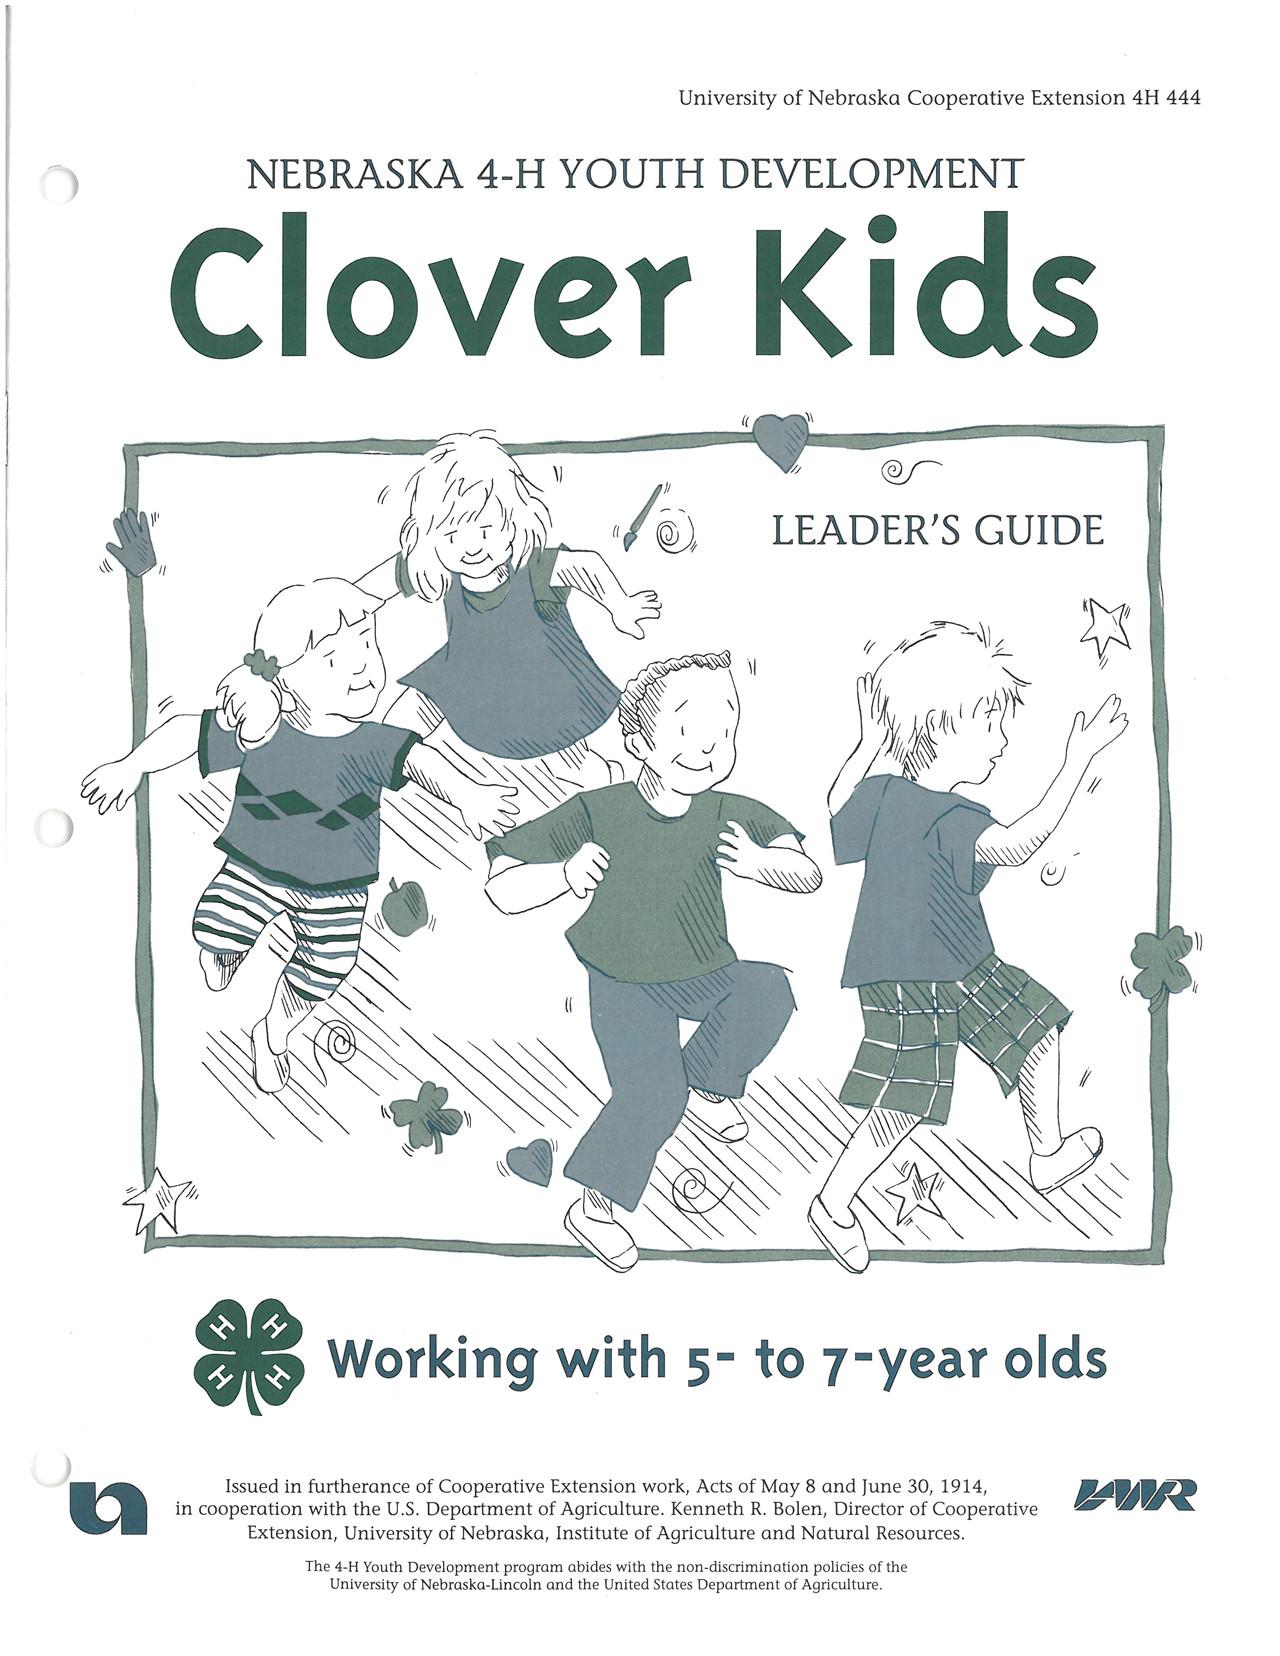 Clover Kids Leader's Guide